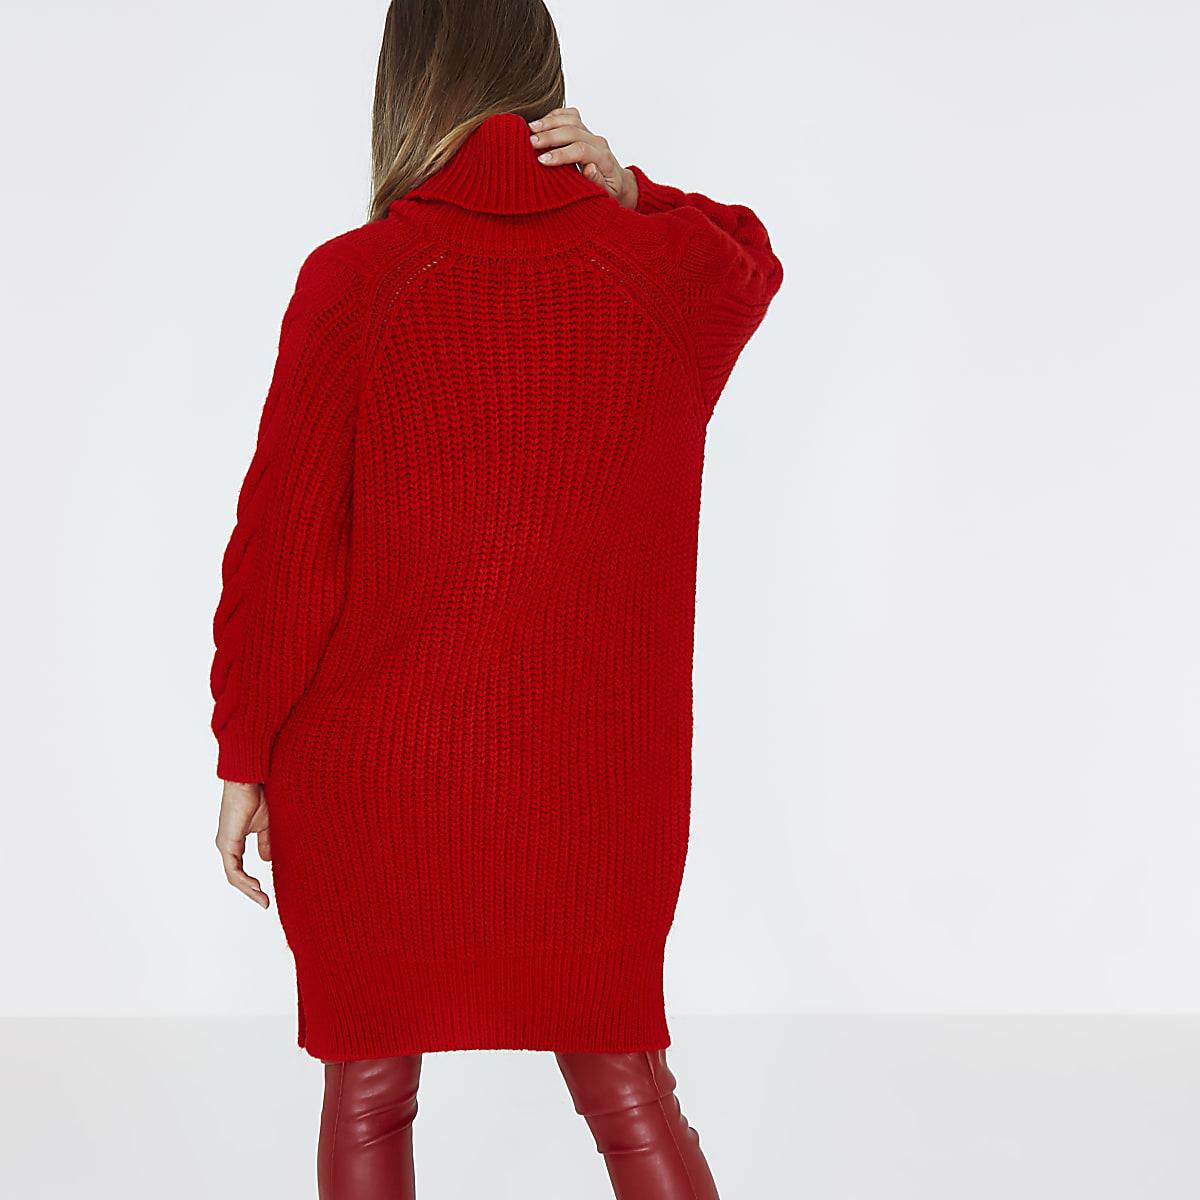 Rode Wollen Jurk.Rode Gebreide Midi Jurk Met Pullover Kabelmotief En Col